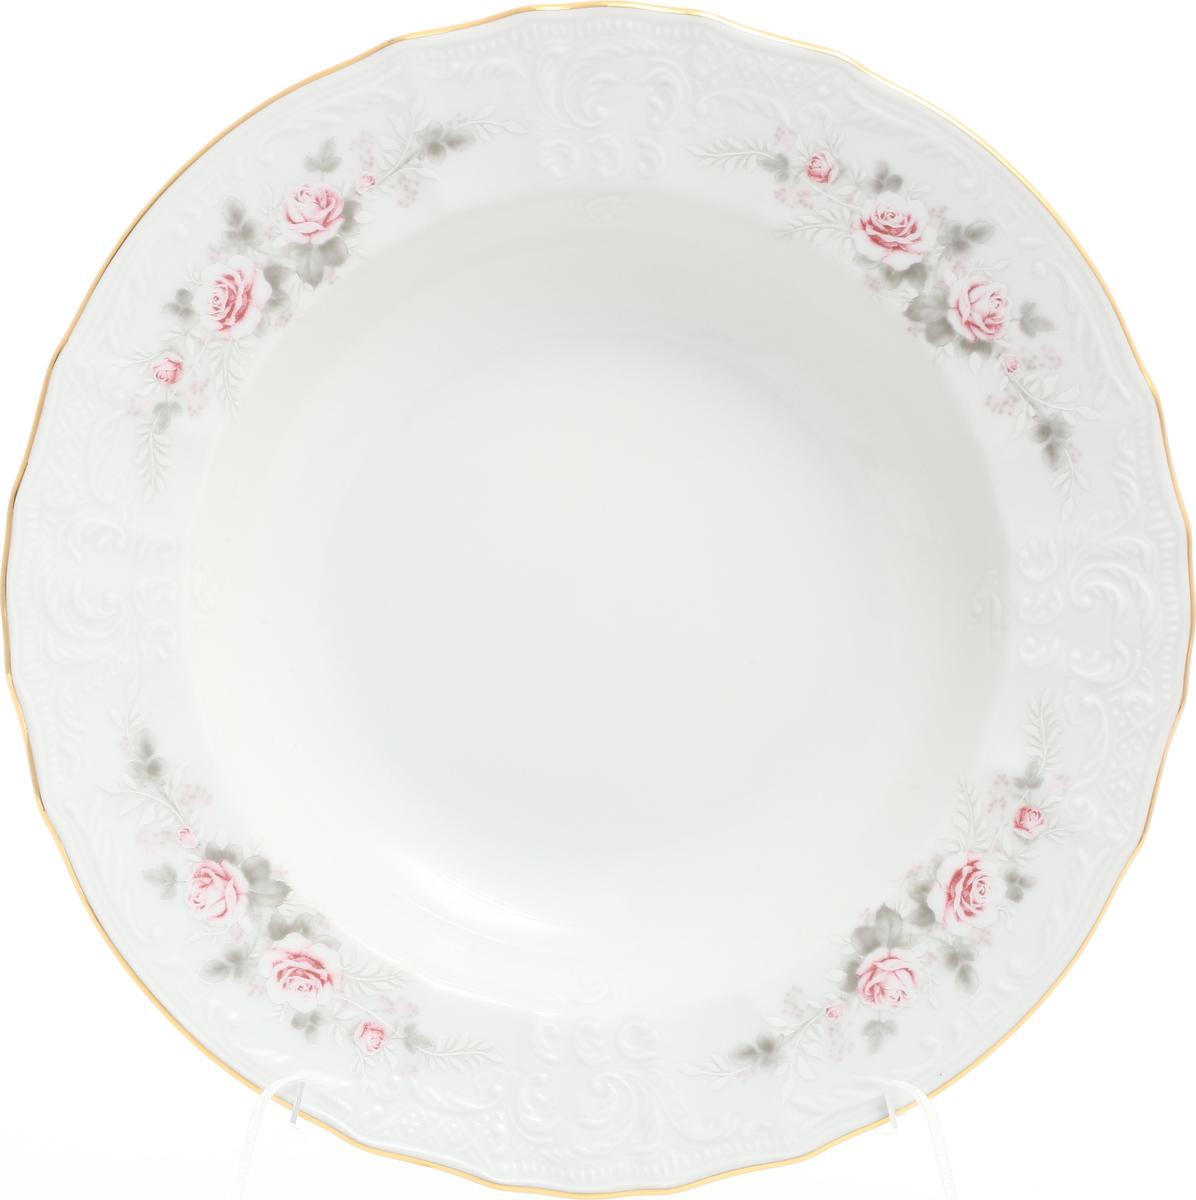 Набор глубоких тарелок Bernadotte Серая роза. Золото, диаметр 23 см, 6 шт набор глубоких тарелок bernadotte серая роза золото диаметр 23 см 6 шт